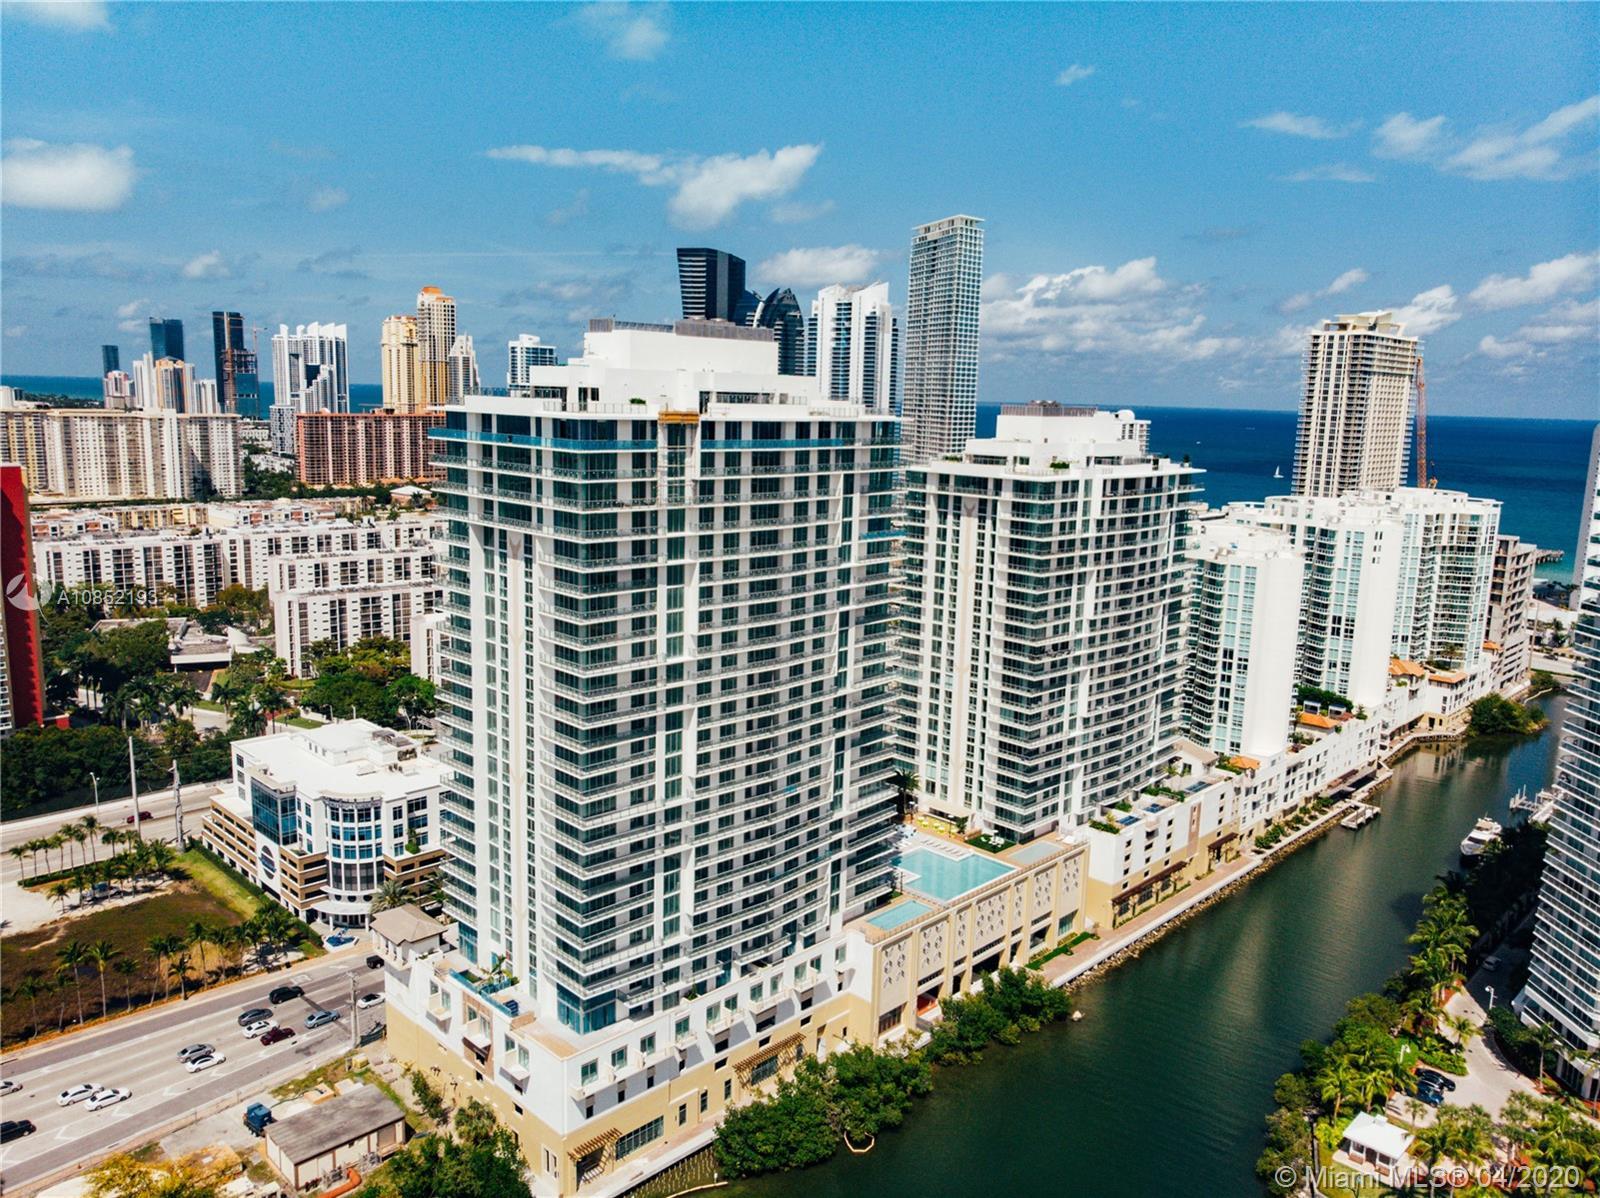 Parque Tower 2 #5-1603 - 330 Sunny Isles Blvd #5-1603, Sunny Isles Beach, FL 33160